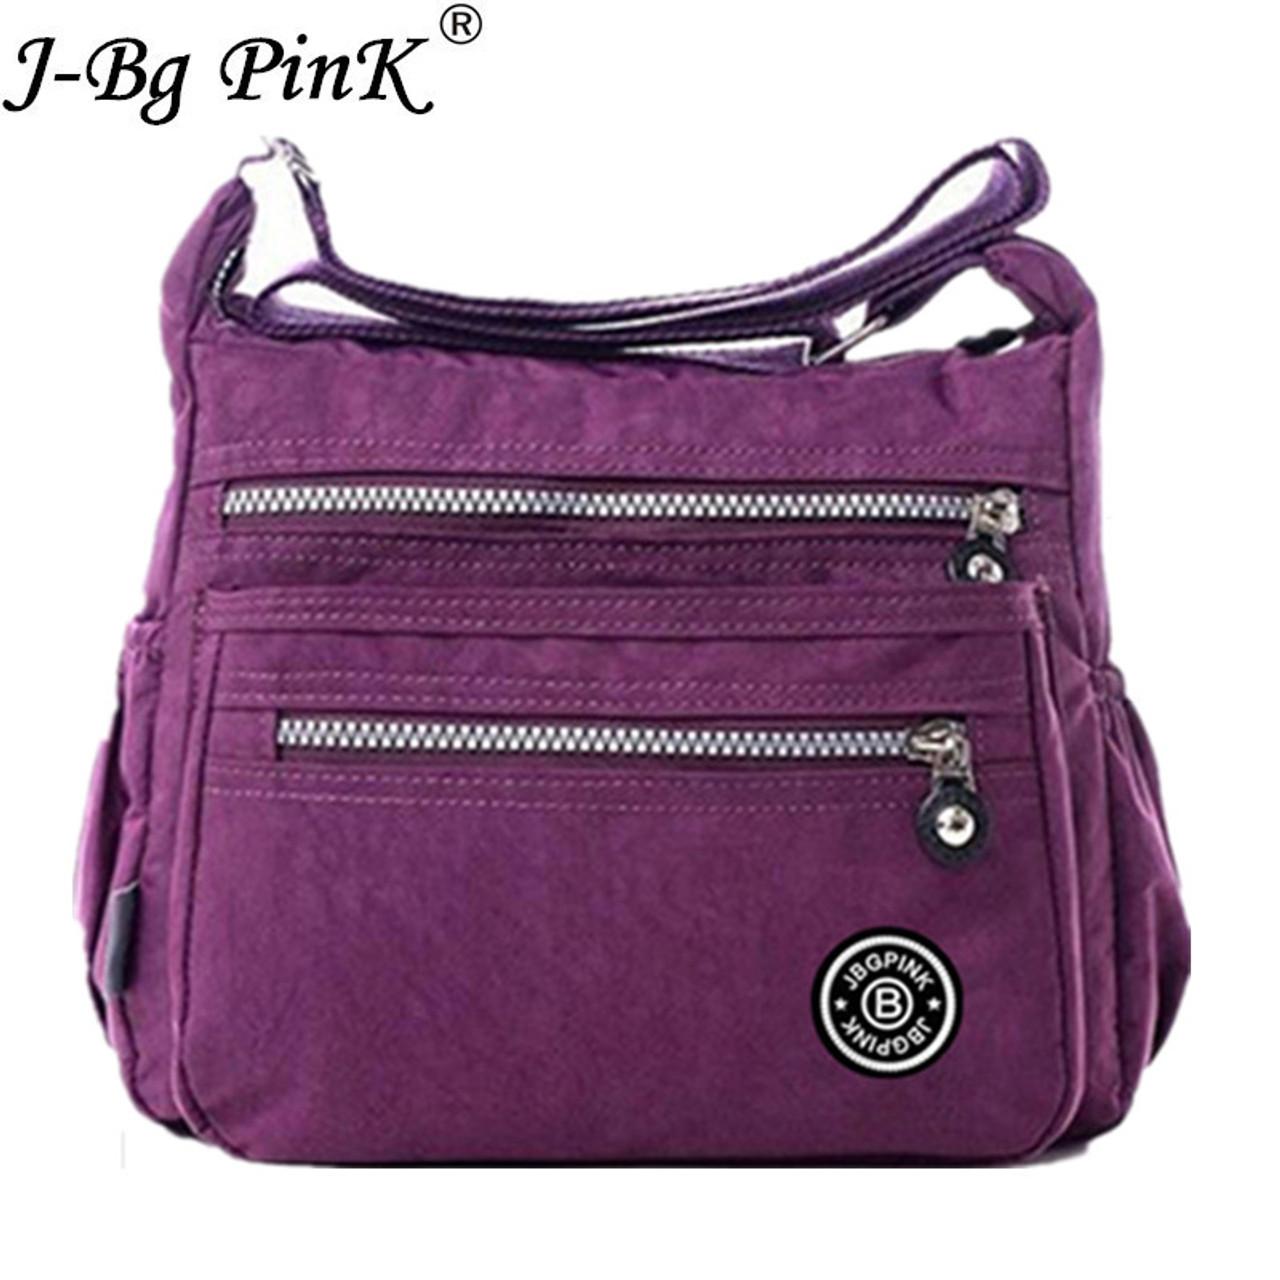 J-BG PinK Women Messenger Bags Nylon Canta Shoulder Bags Handbags Famous  Brands Designer Crossbody ... 0e31753d348cf